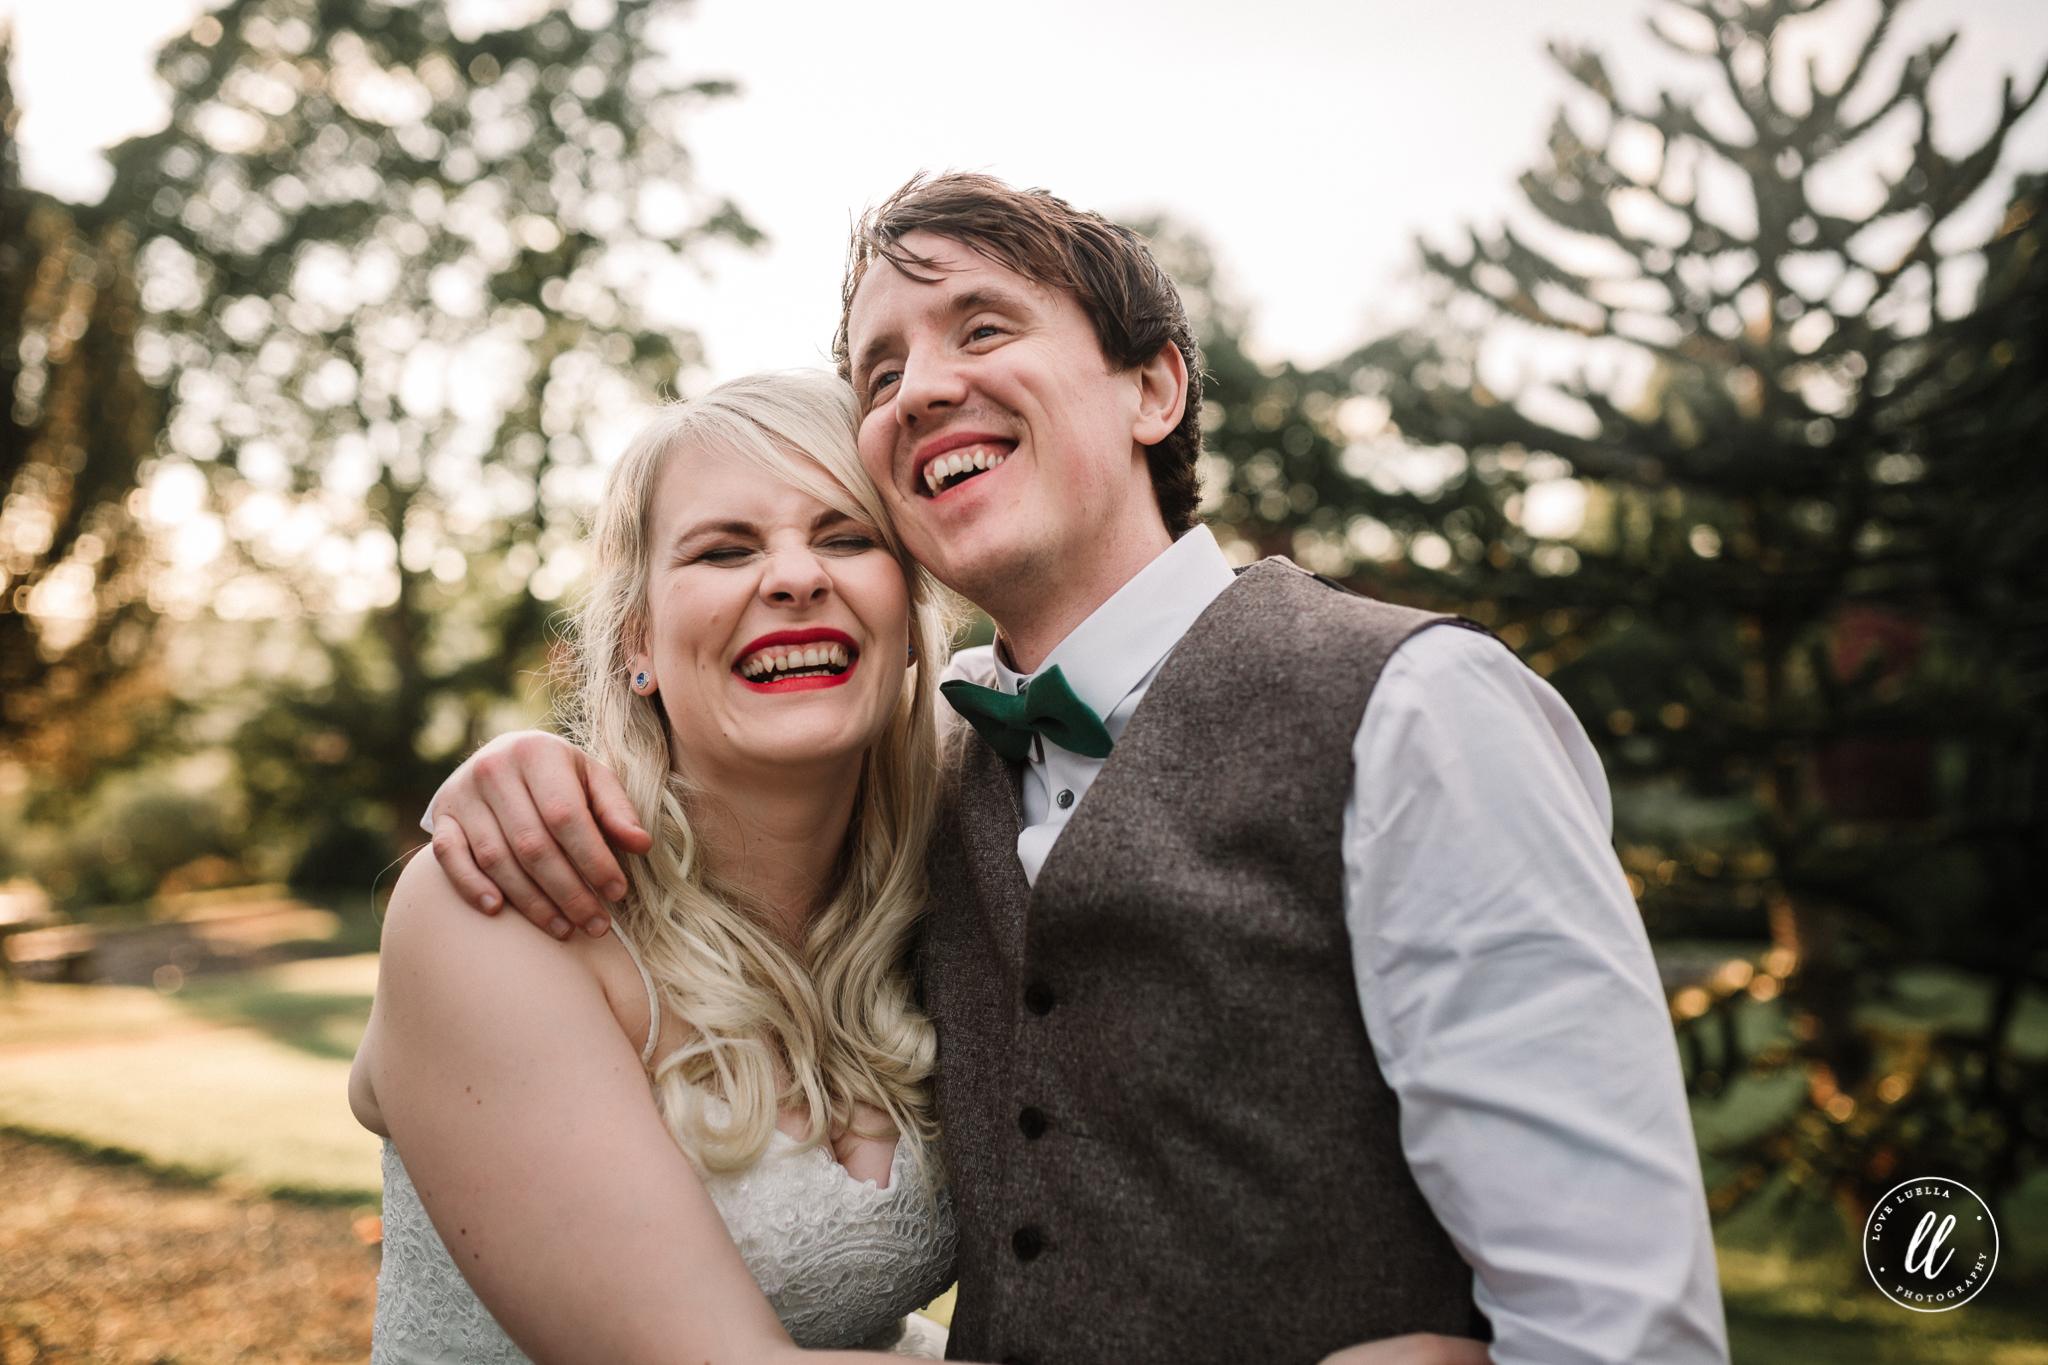 Fun Wedding Photography In Cheshire